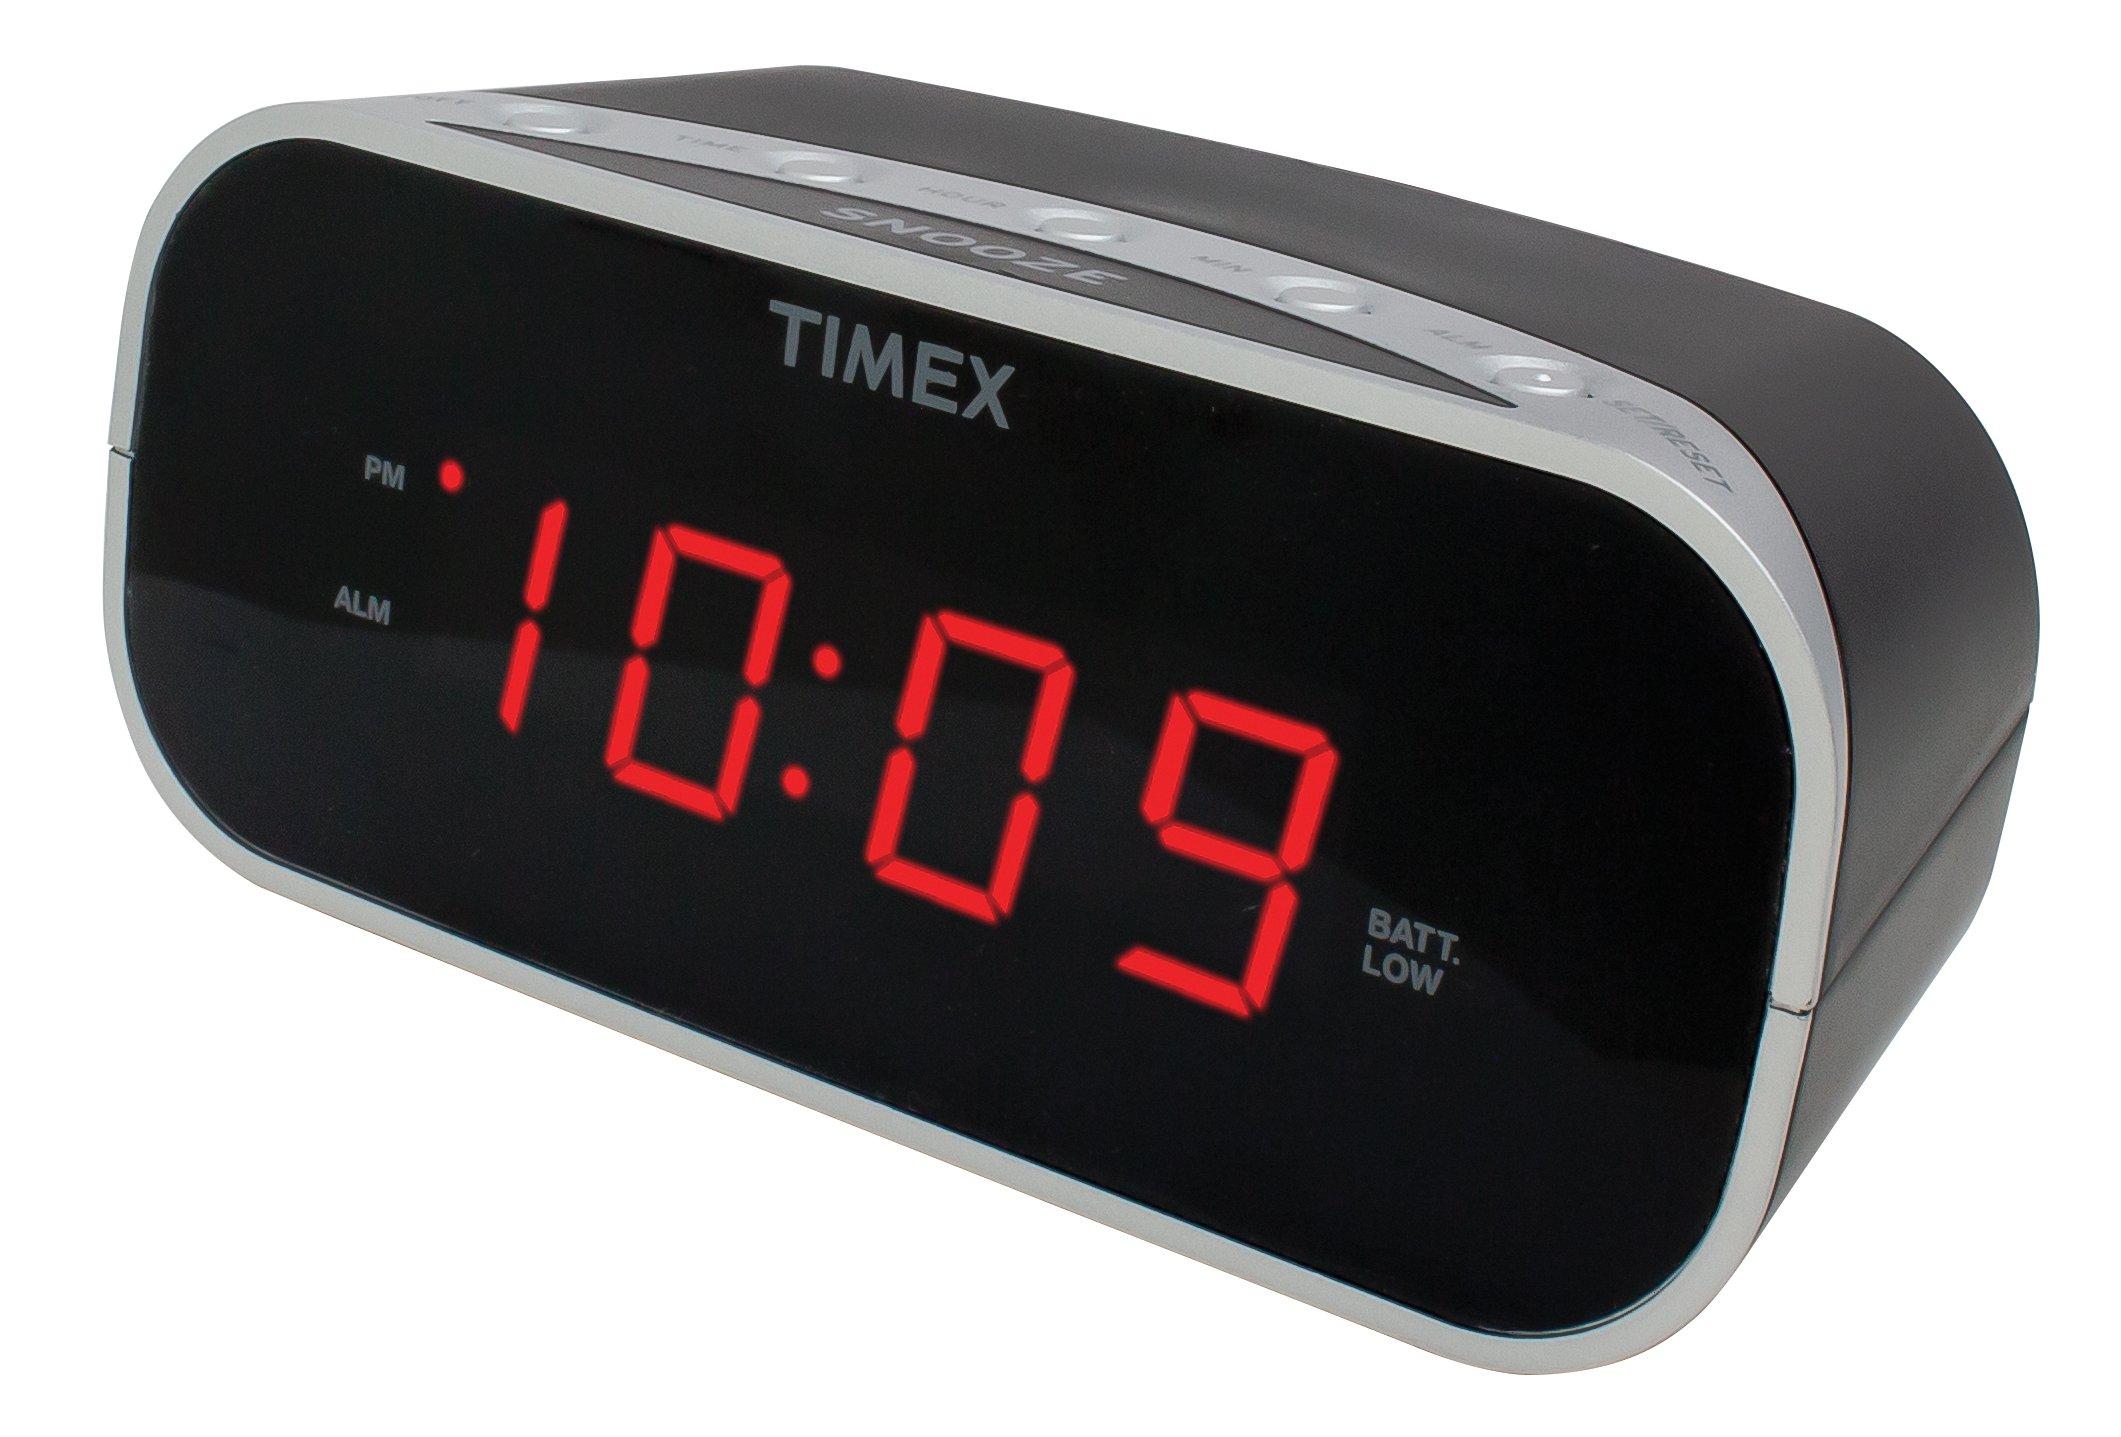 Timex T121B Alarm 0 7 Inch Display